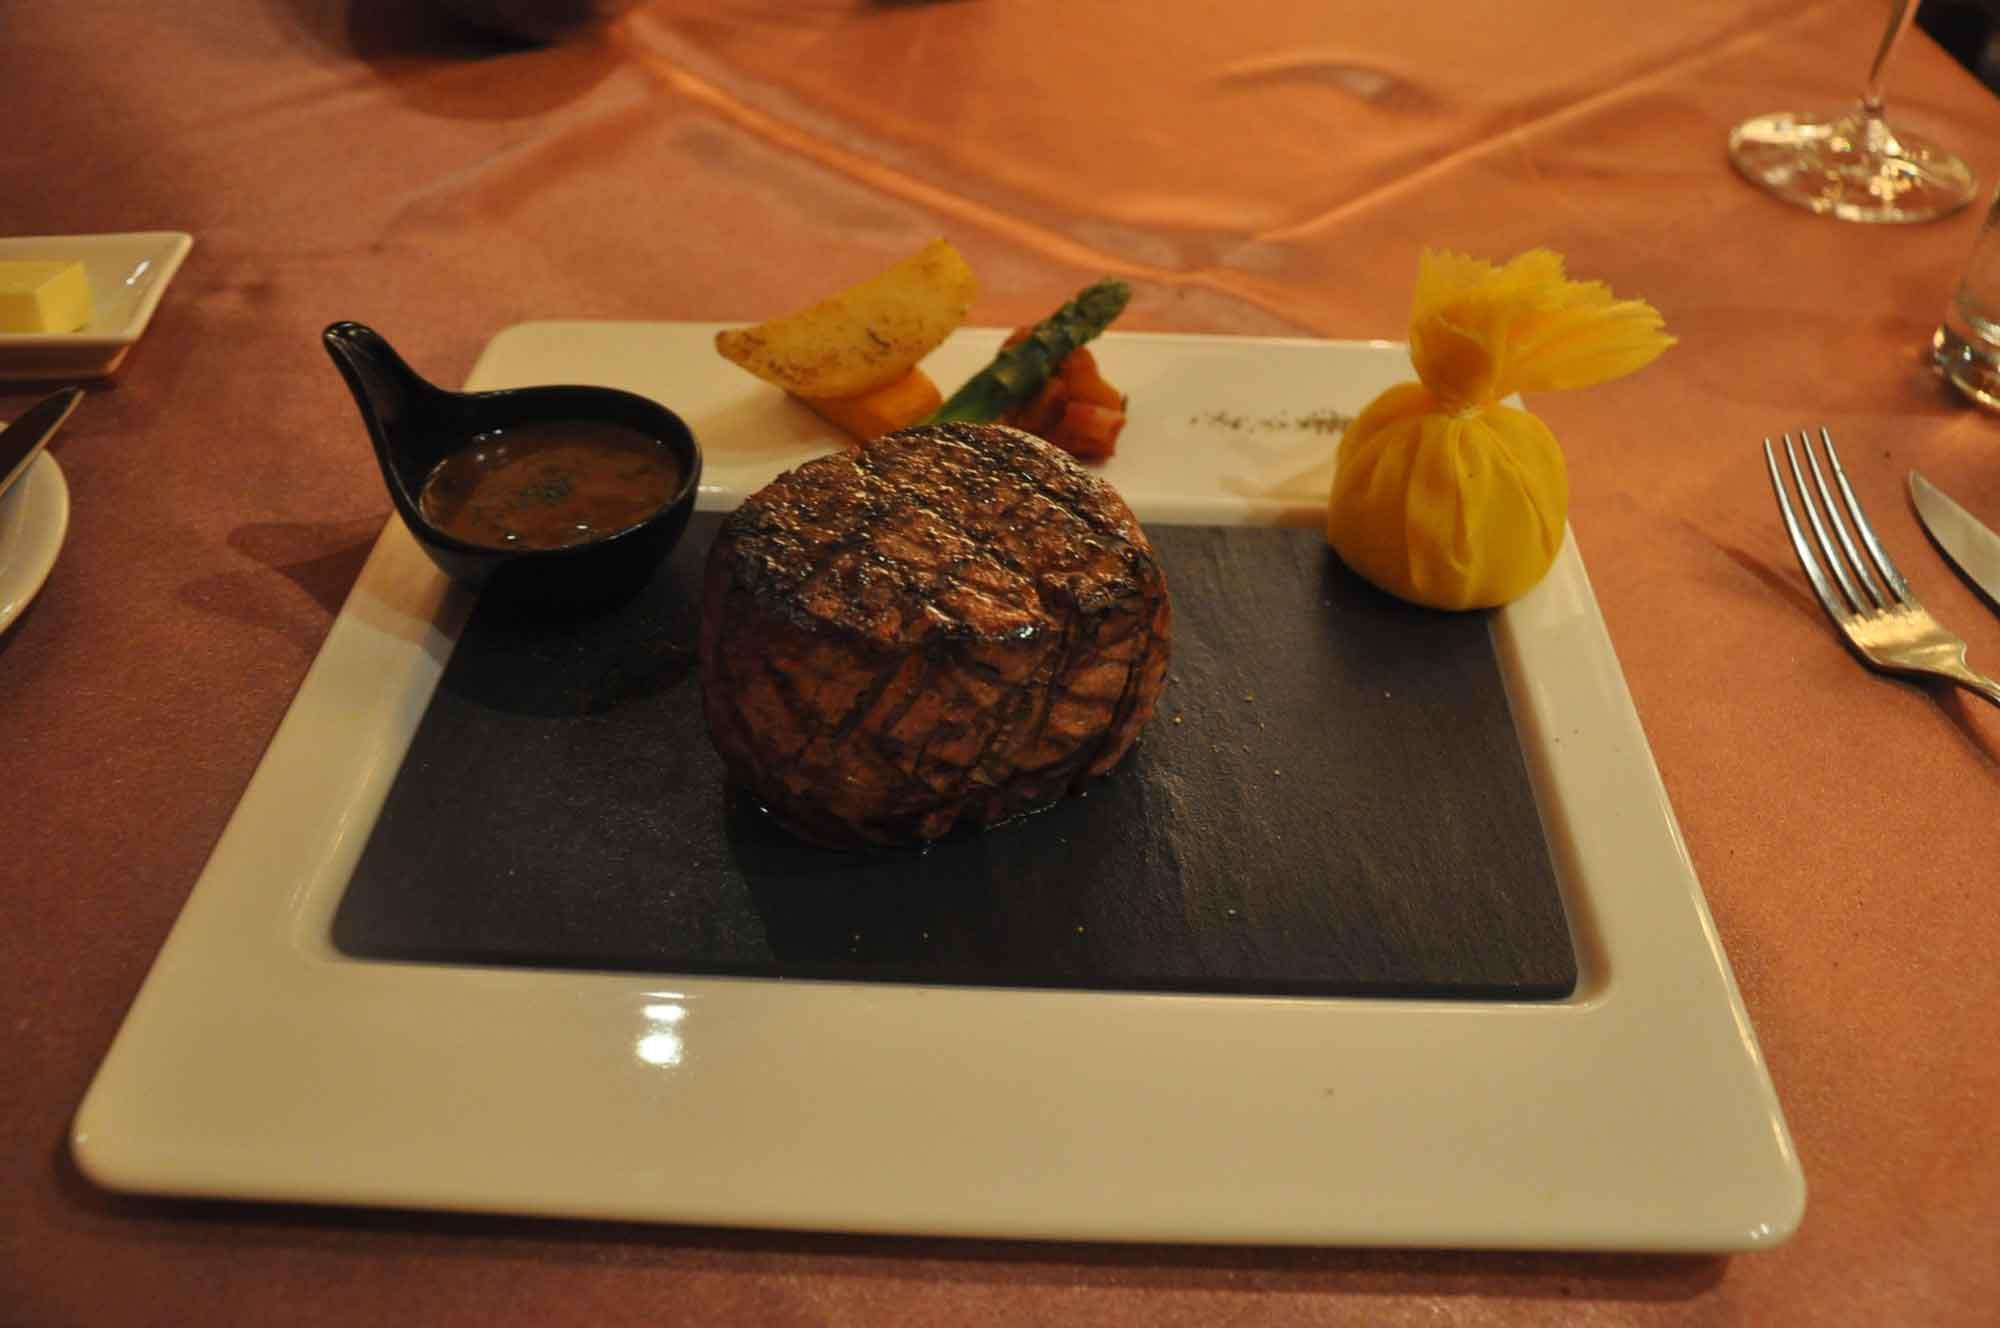 Copa Steakhouse 12 ounce filet mignon